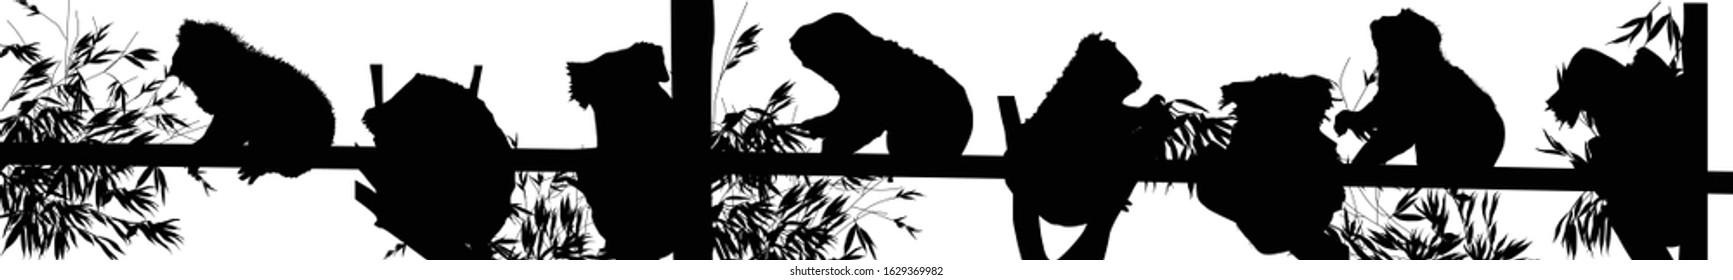 illustration with black silhouettes of koala on white background